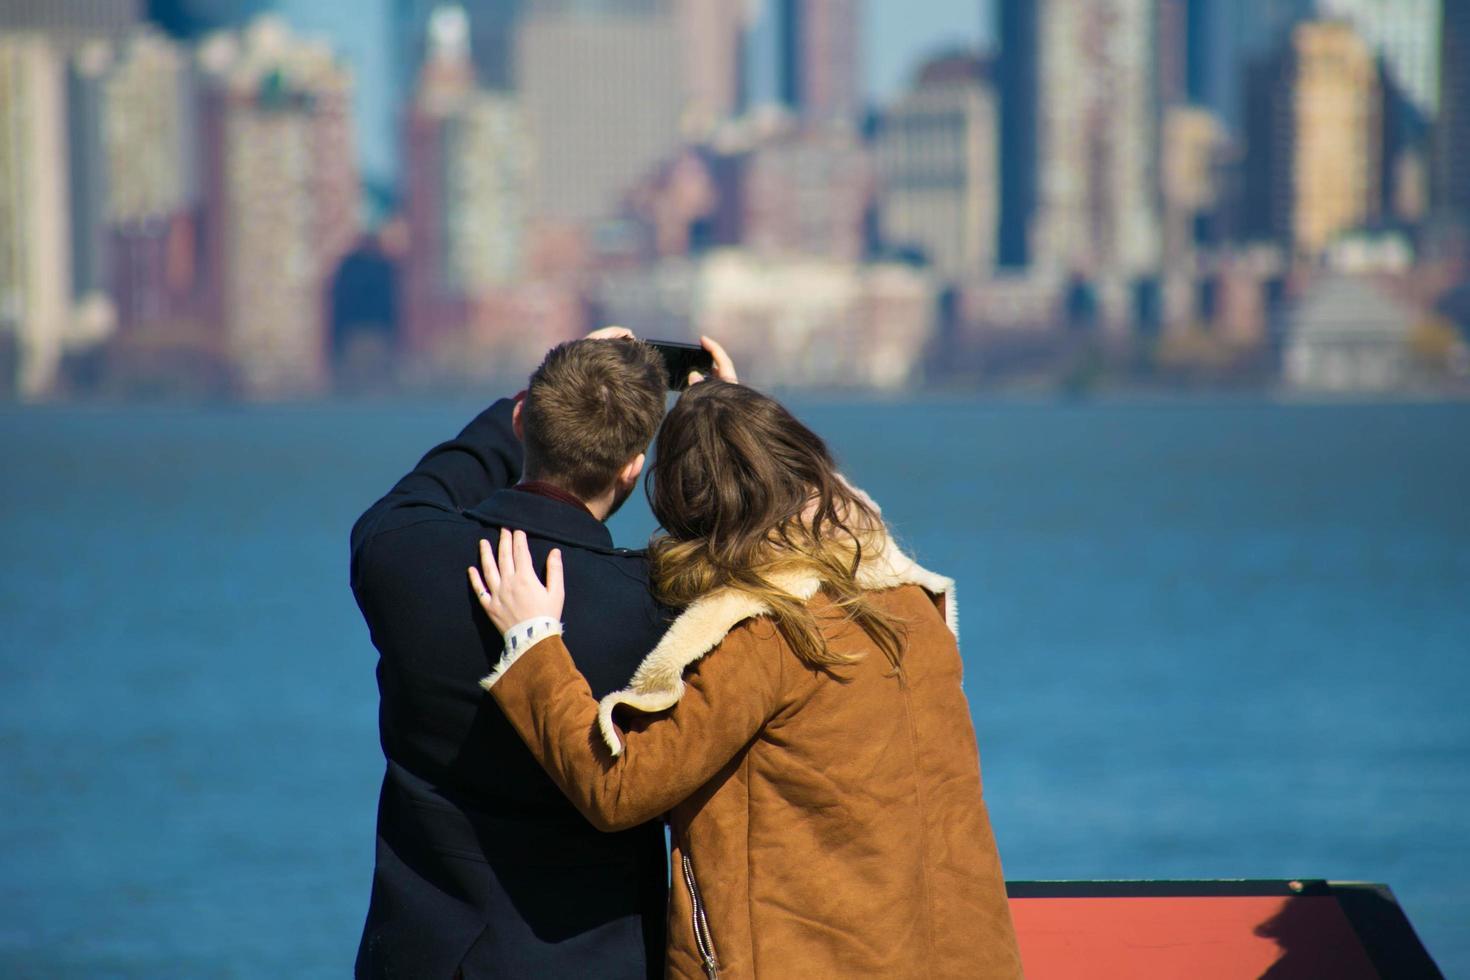 New York City, 2020 - Couple takes selfie on Staten Island photo